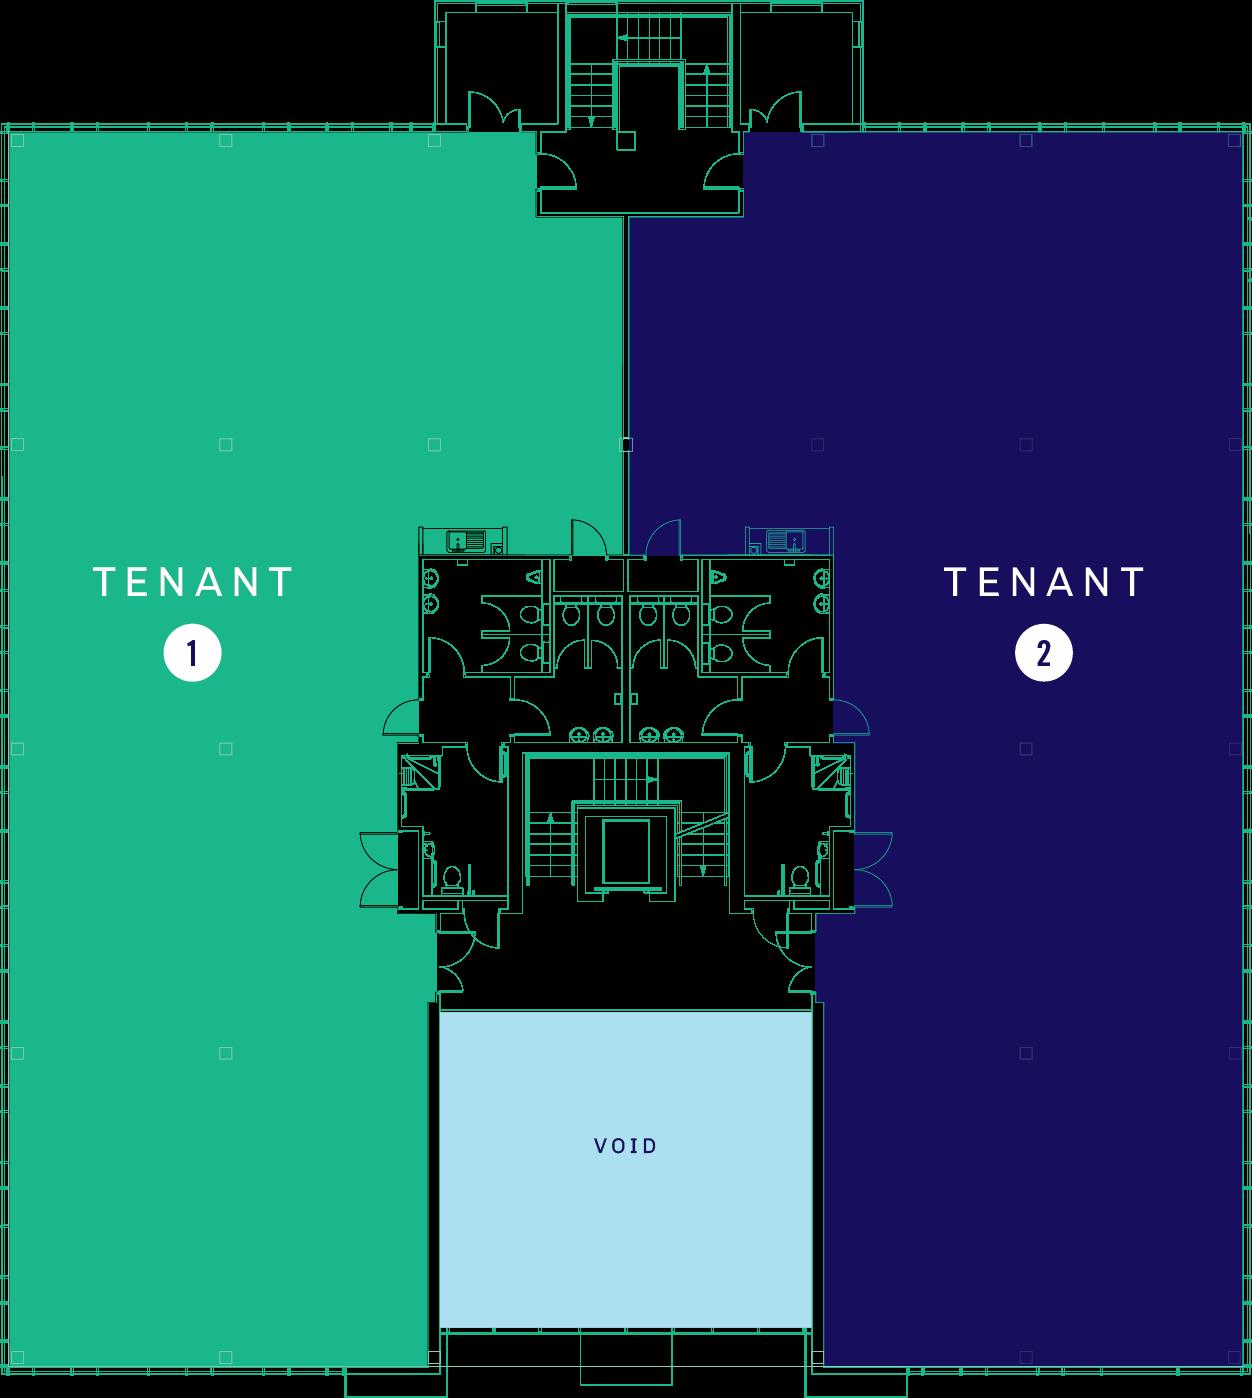 Floor Plate Singe Tenant Option 1